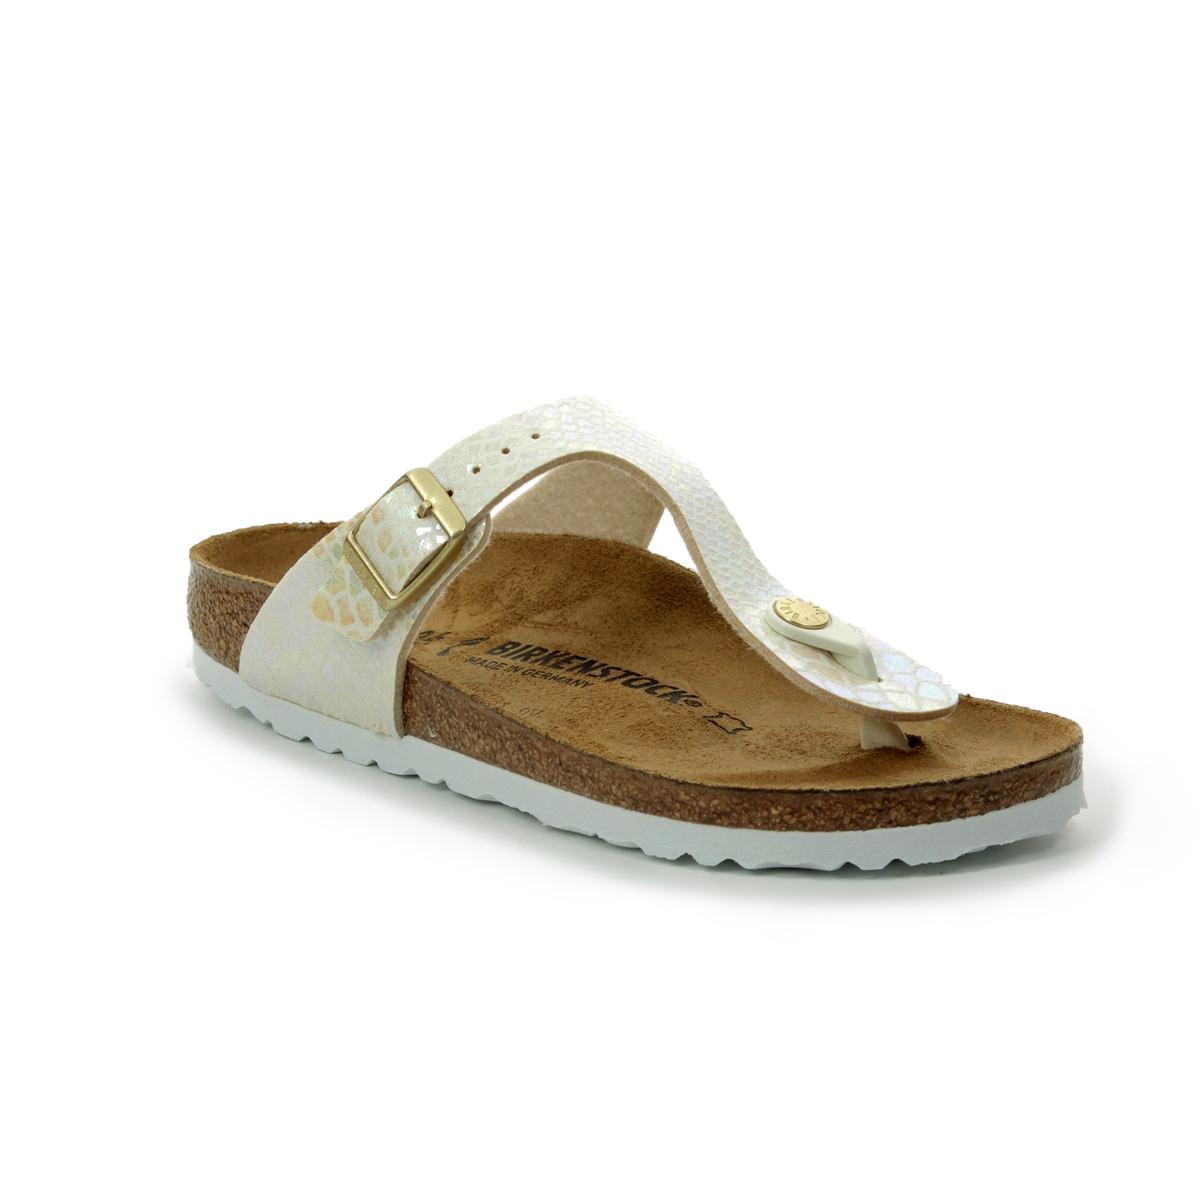 8944fb5f41ac Birkenstock Toe Post Sandals - Beige - 0847433 GIZEH SHINY SNAKE CREAM